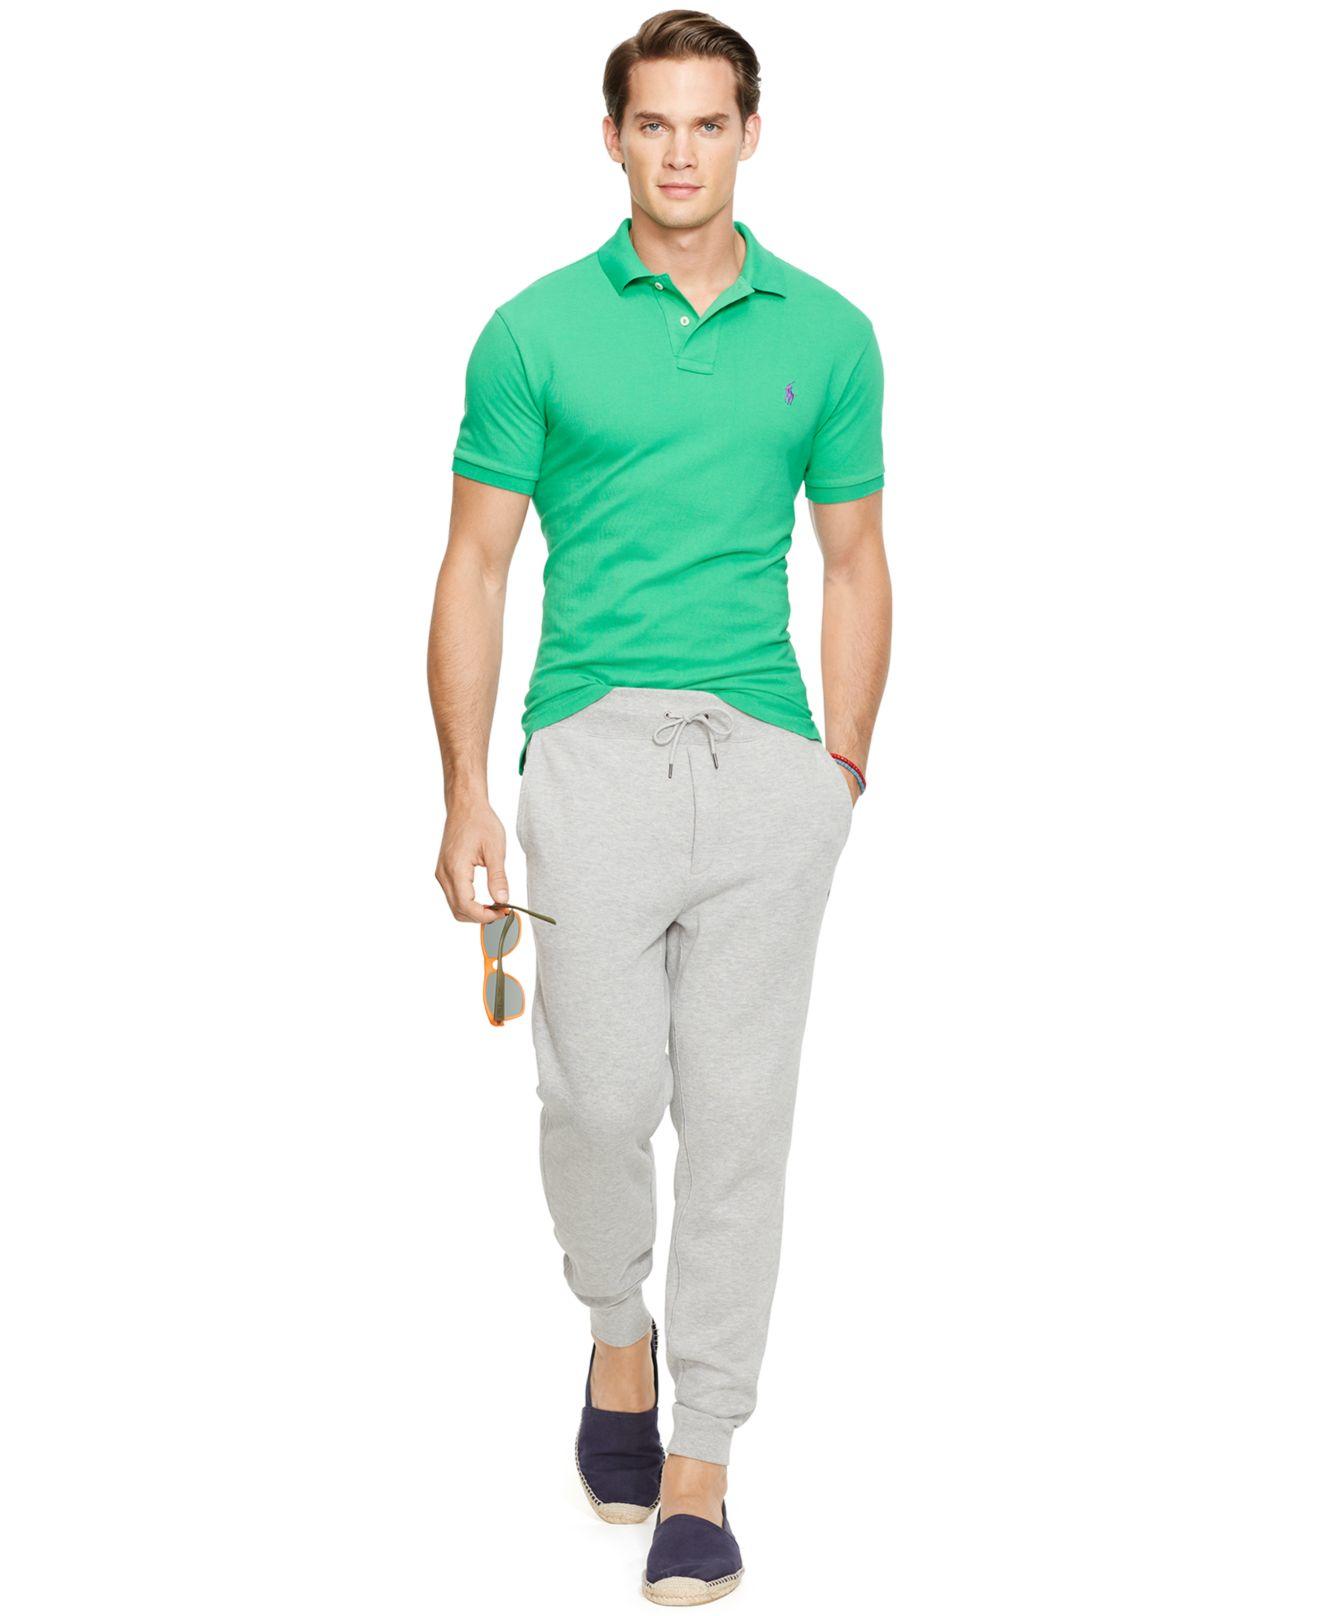 polo ralph lauren men 39 s custom fit mesh polo shirt in. Black Bedroom Furniture Sets. Home Design Ideas